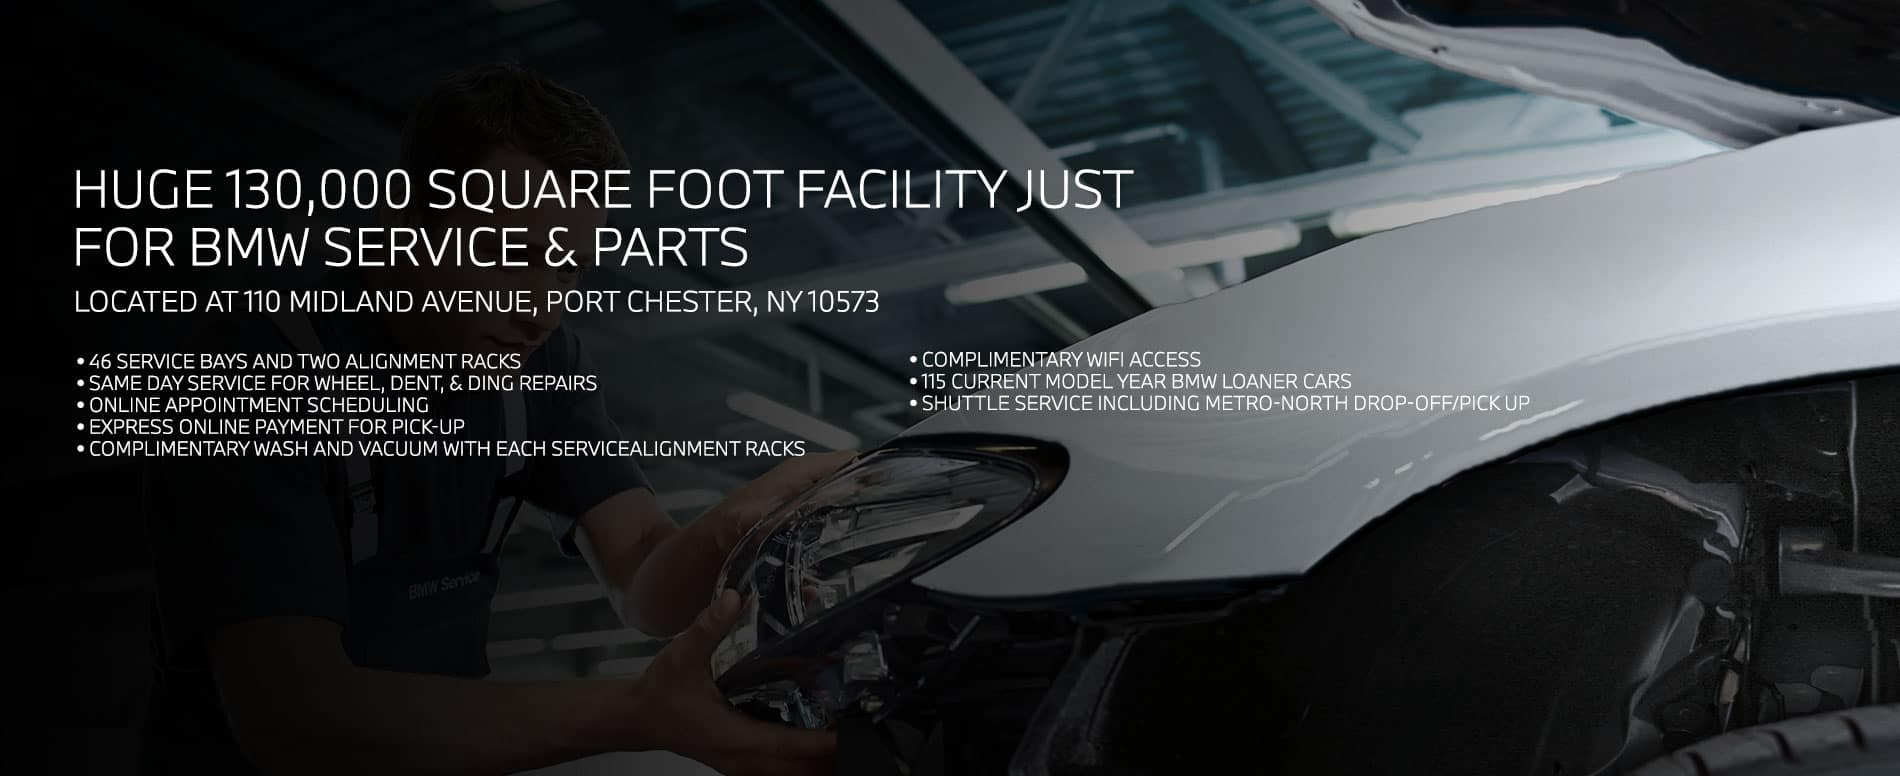 BMW Service & Parts Center